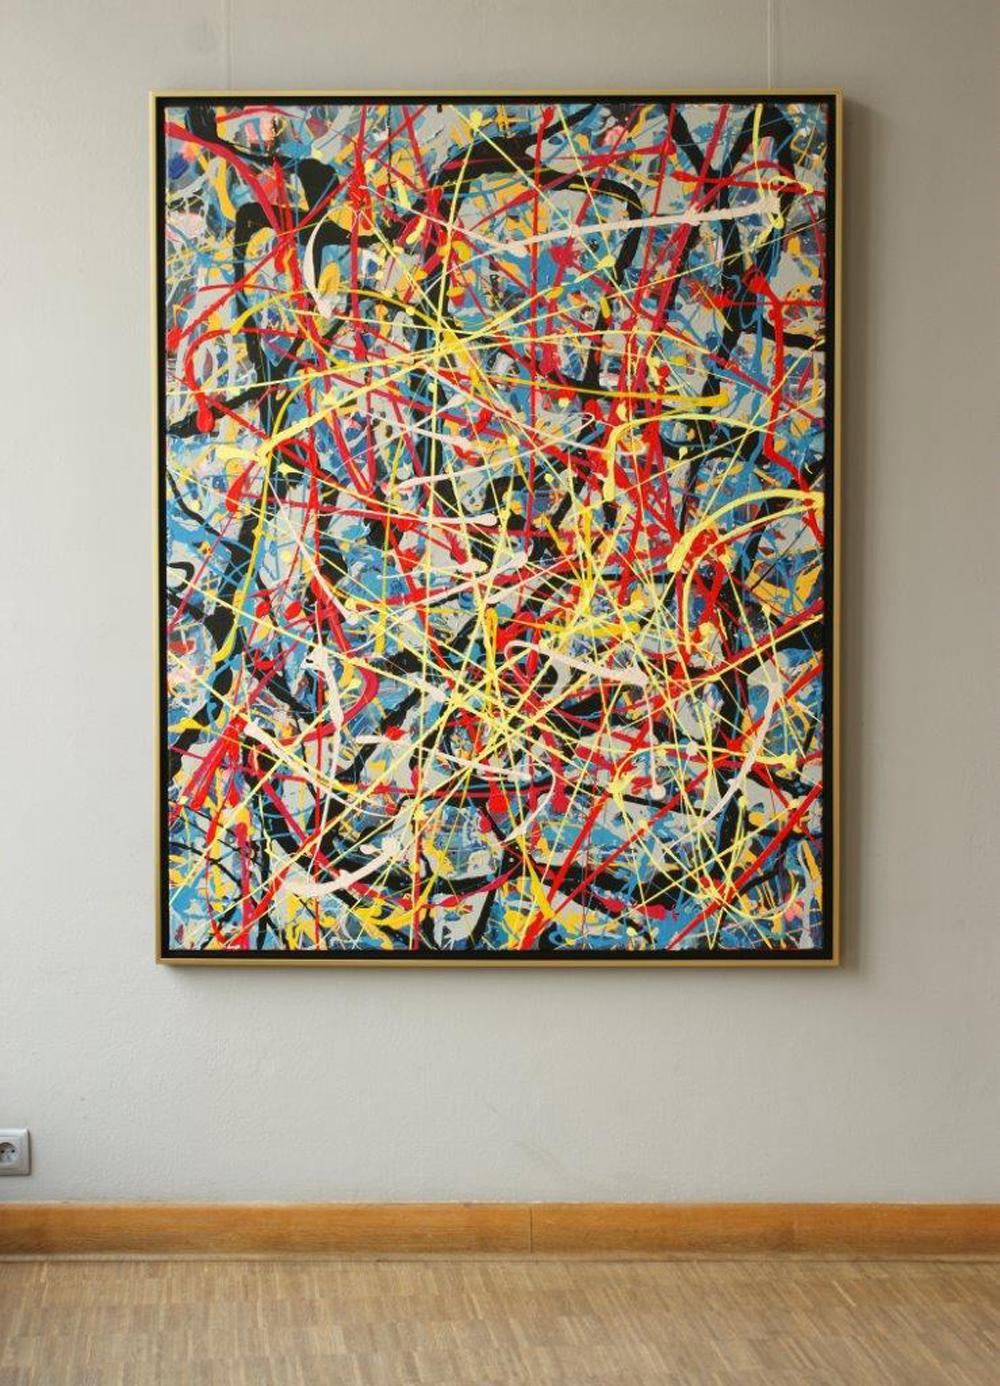 Edward Dwurnik : Painting No. 12-2615 Series XXV Year 2000